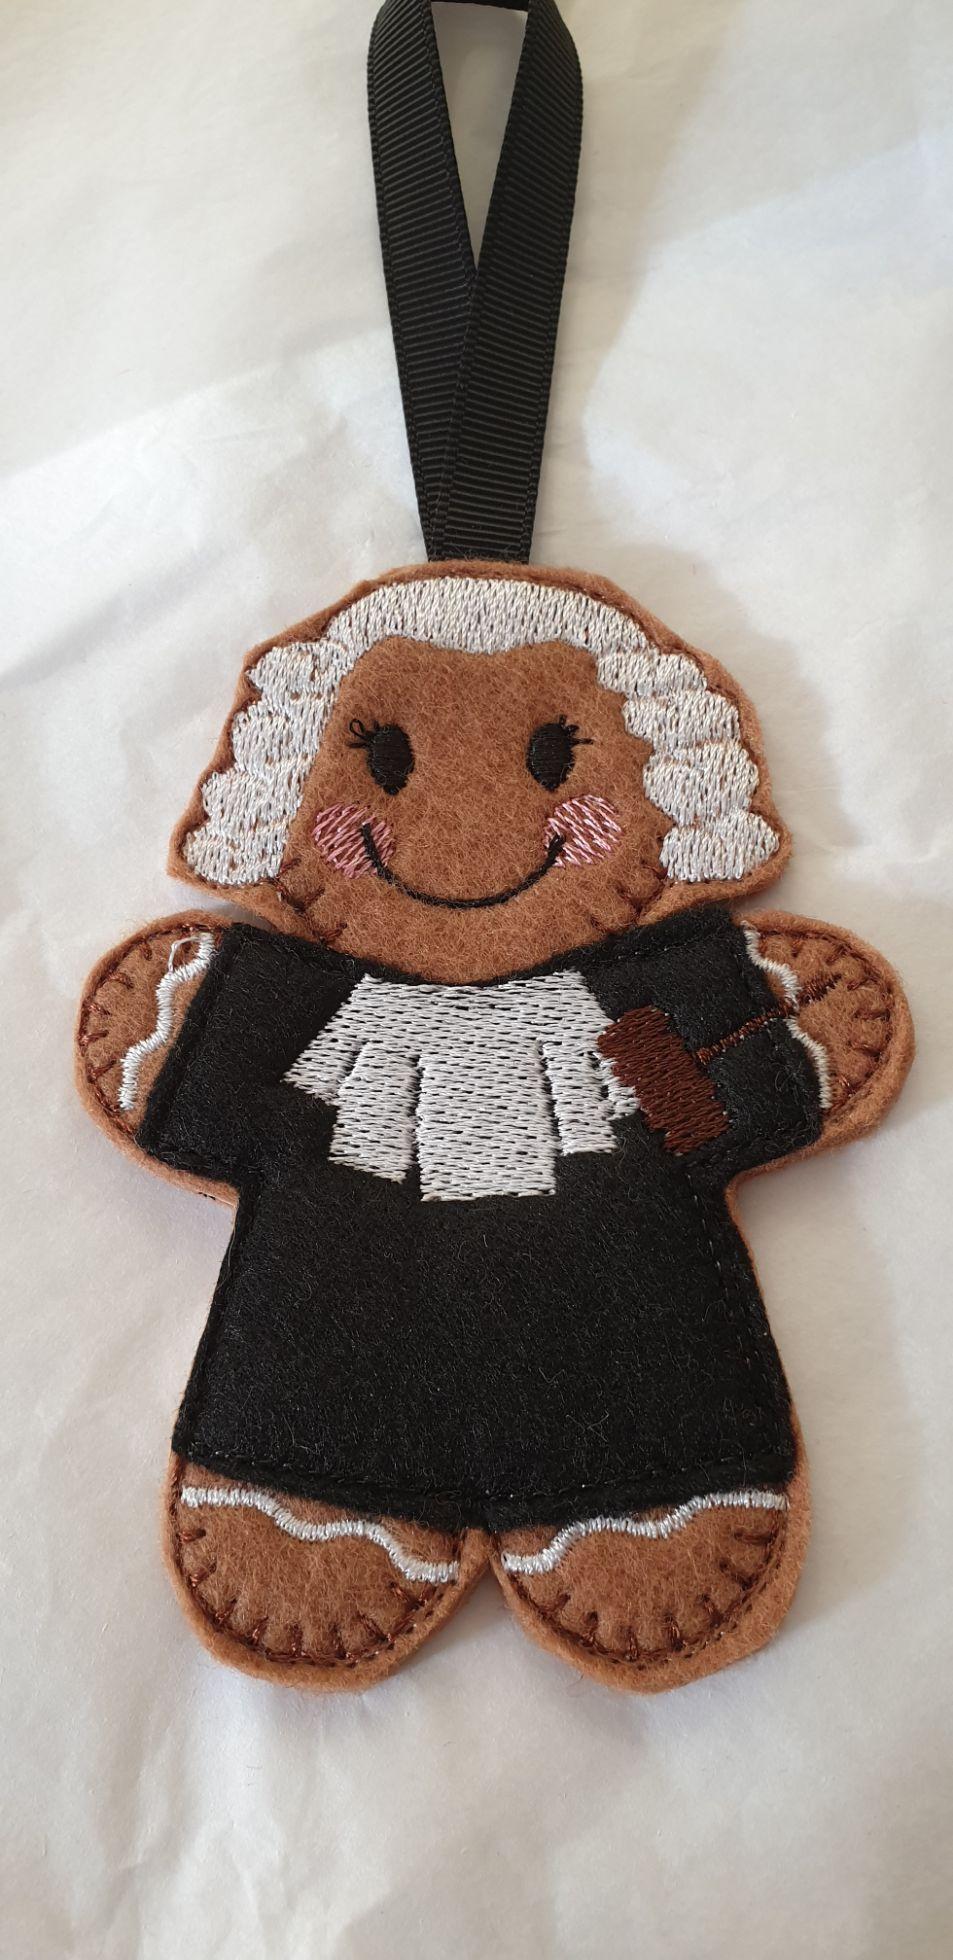 Judge Gingerbread